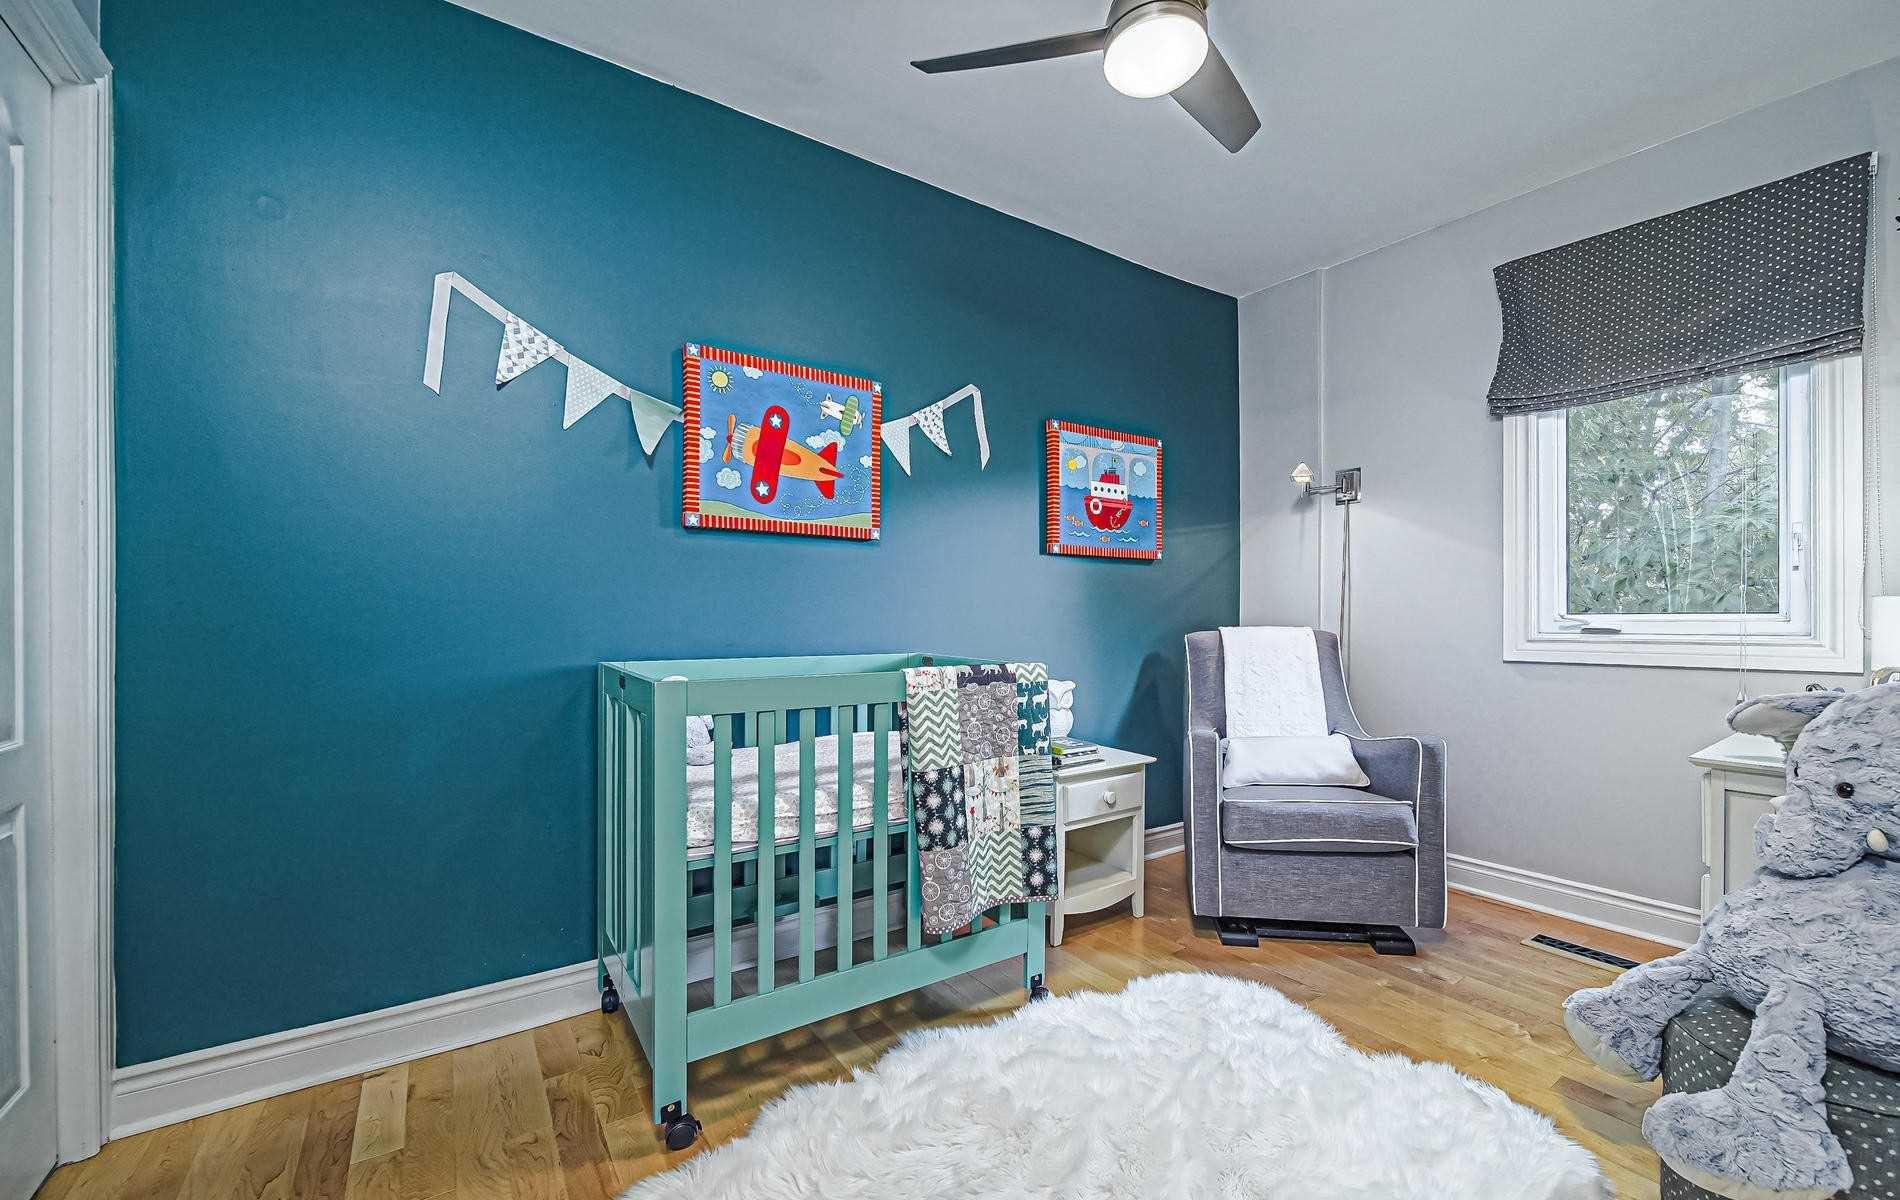 Photo 12: Photos: 84 Rushbrooke Avenue in Toronto: South Riverdale House (2-Storey) for sale (Toronto E01)  : MLS®# E4600791